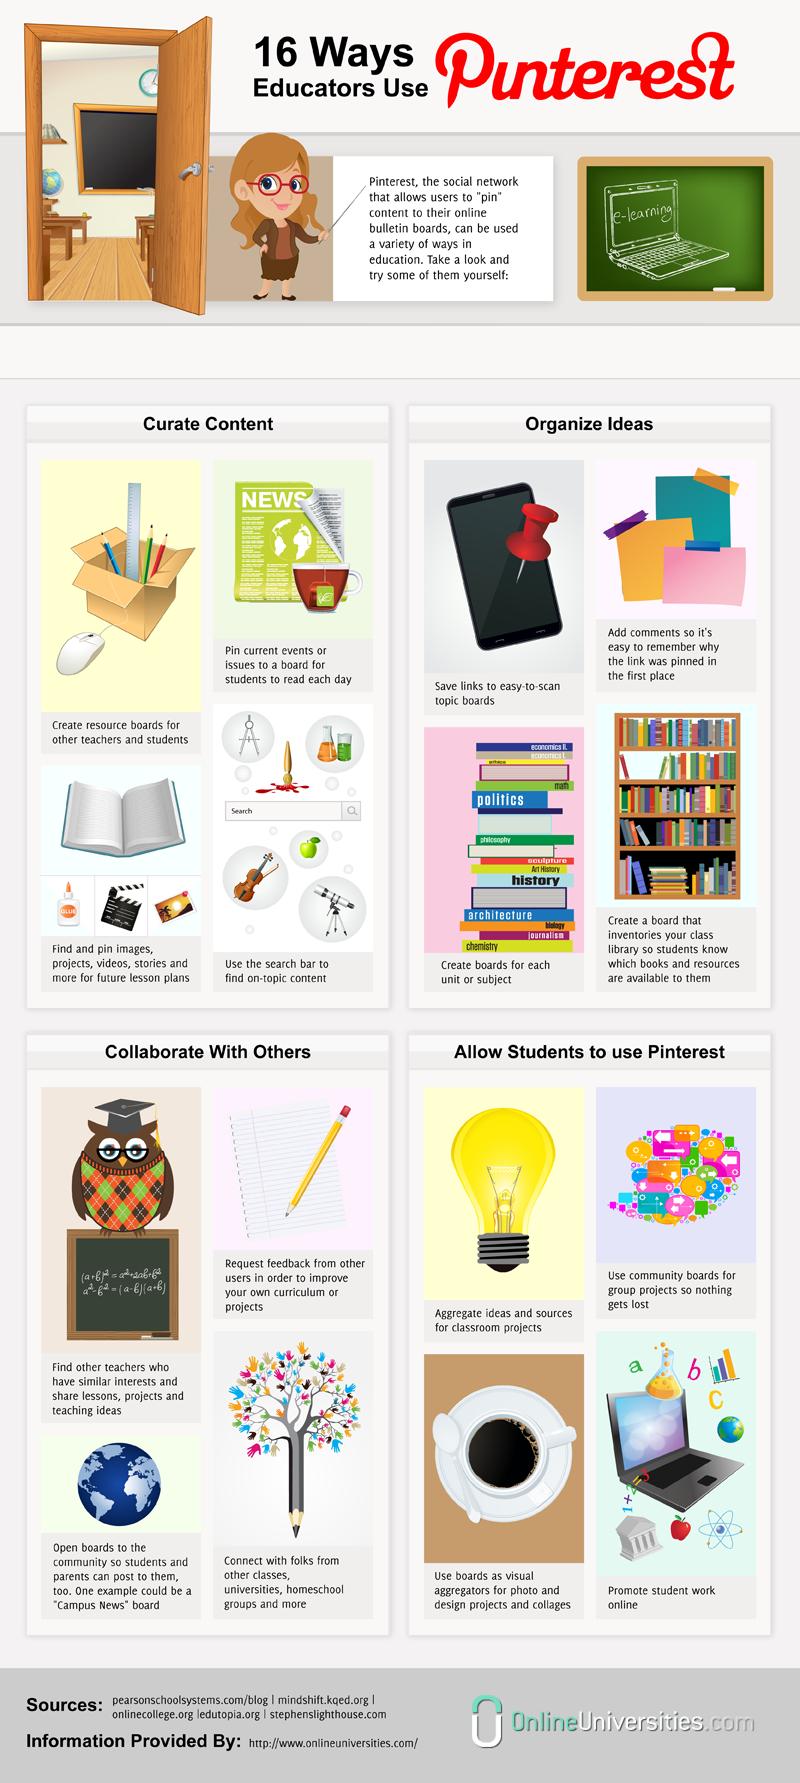 http://wwwhatsnew.com/wp-content/uploads/2012/04/How-Educators-Use-Pinterest-800.png